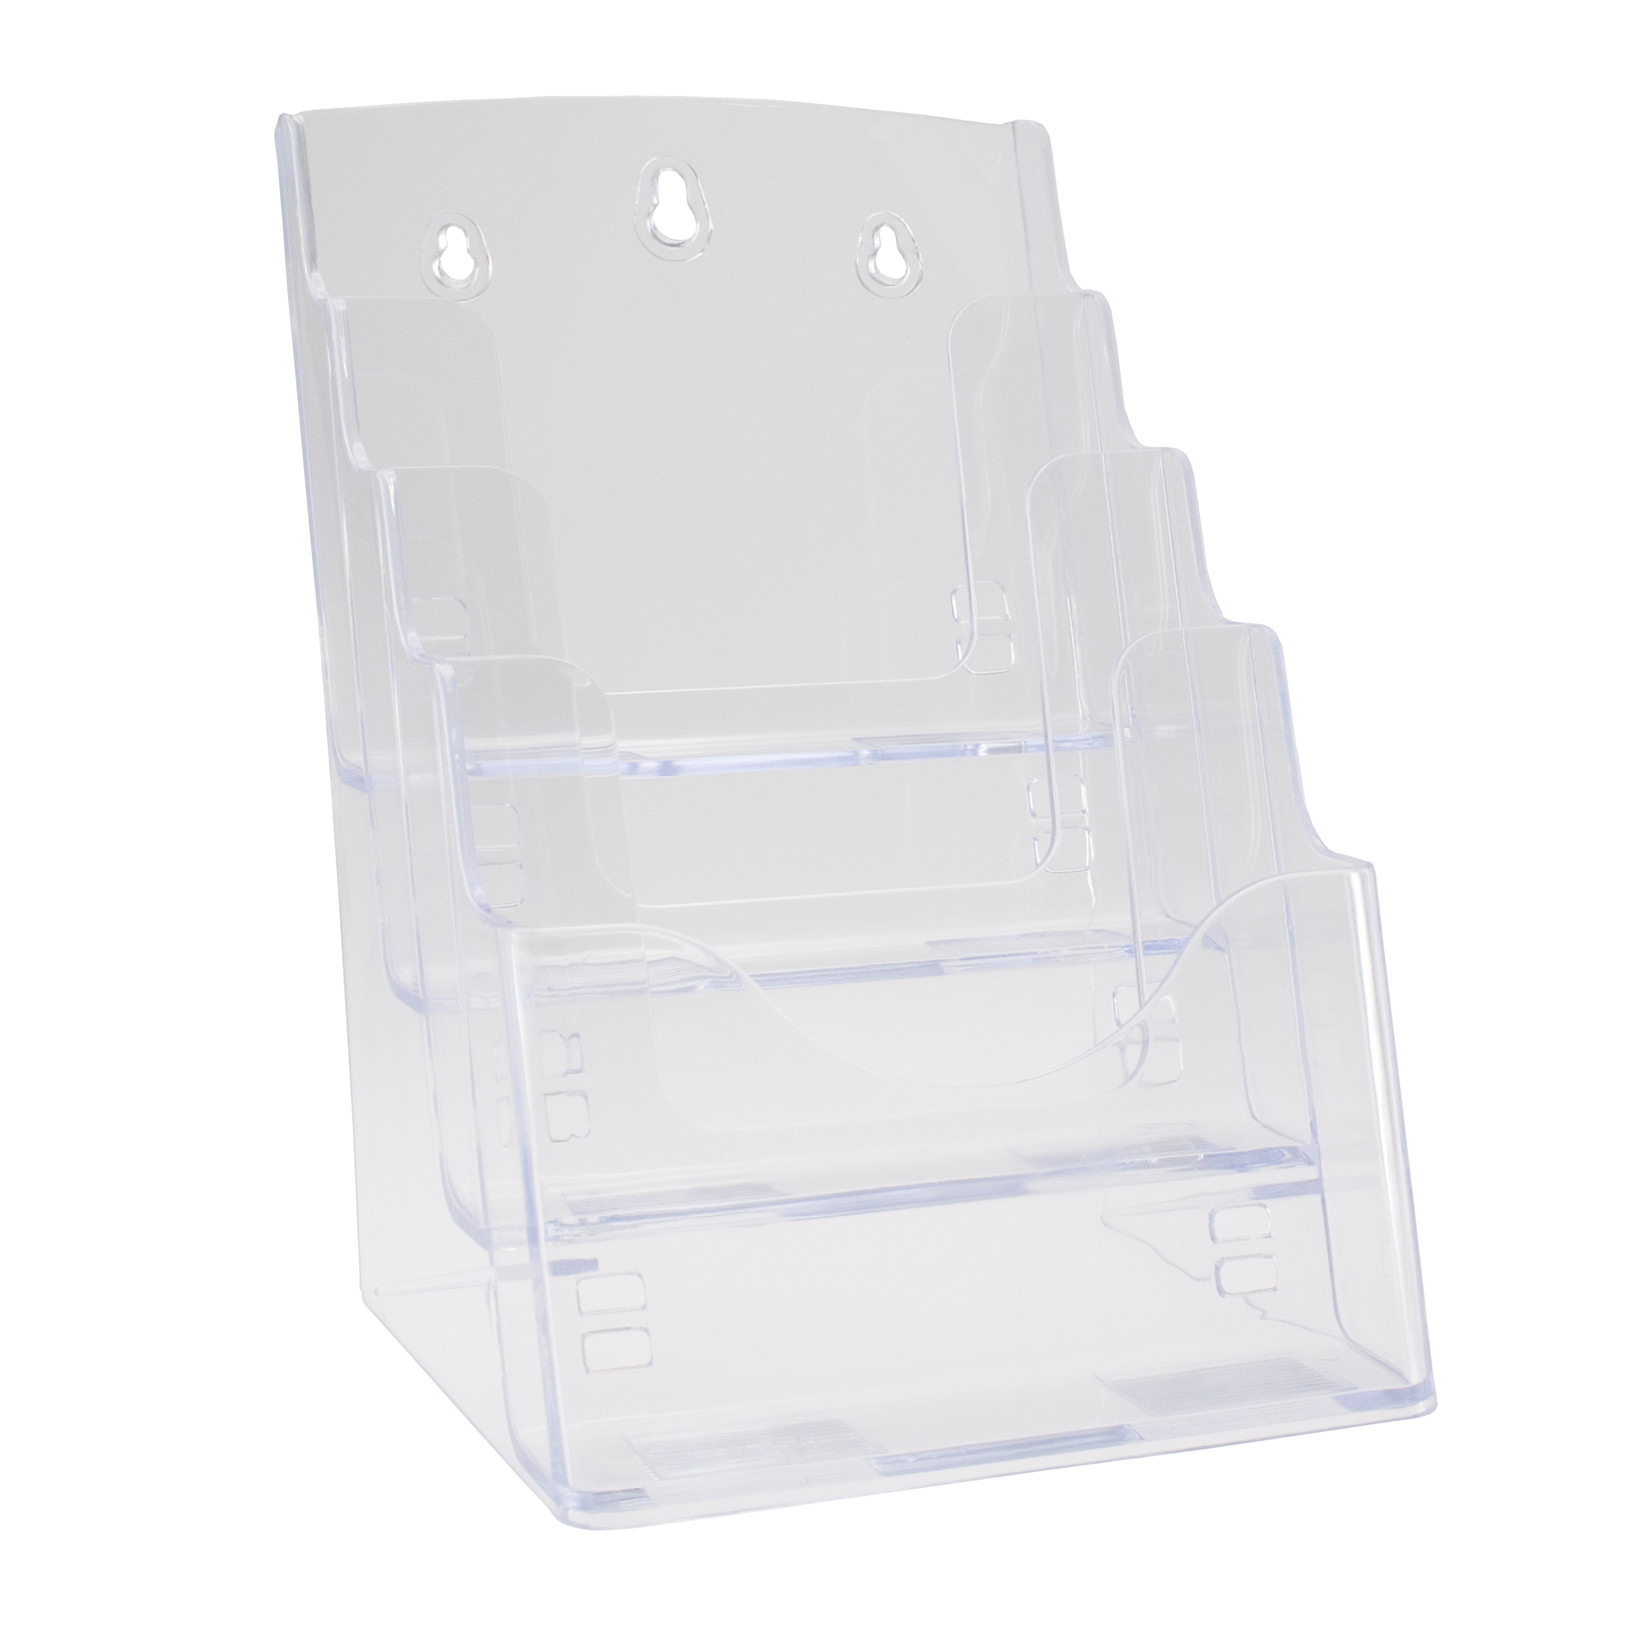 Brochureholder BNT A5 klar 4 rum bord/væg B:16,6 H:25,2 D 1,6 cm